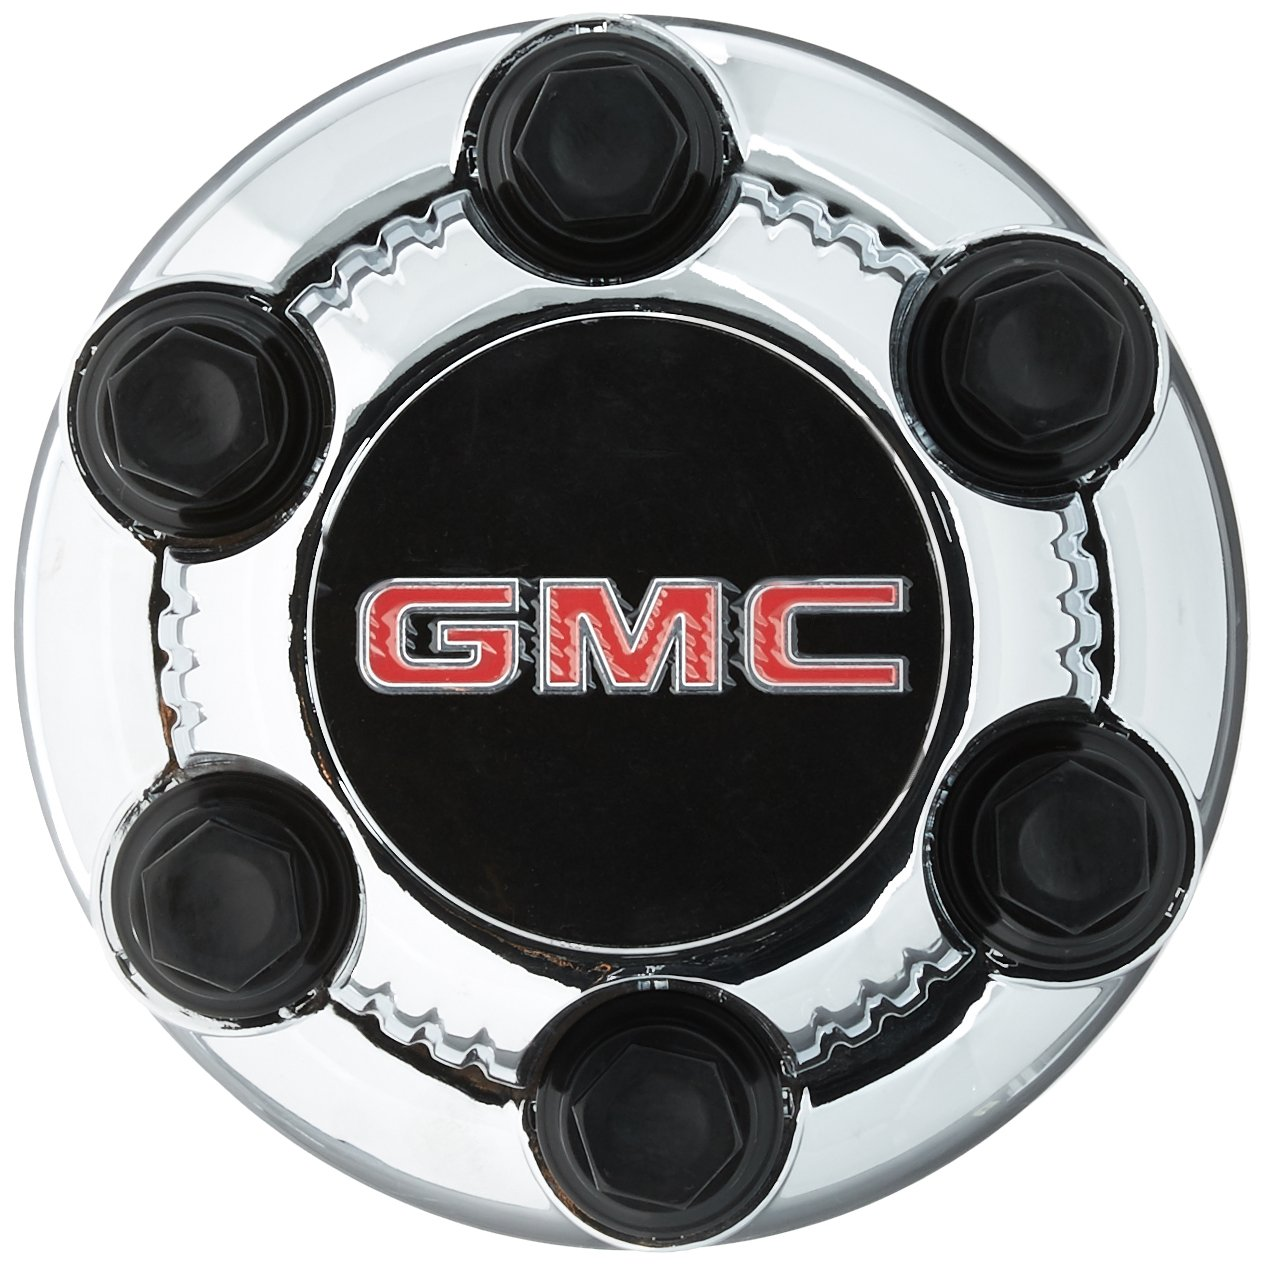 16 17 Inch OEM GMC 6 Lug Chrome Plated Center Cap Hubcap Wheel Rim Cover 1999-2013 1500 Pickup Truck VAN SUV Sierra Savana Yukon 5129 5223 7.25 by GMC General Motors hollander of wheel 5129